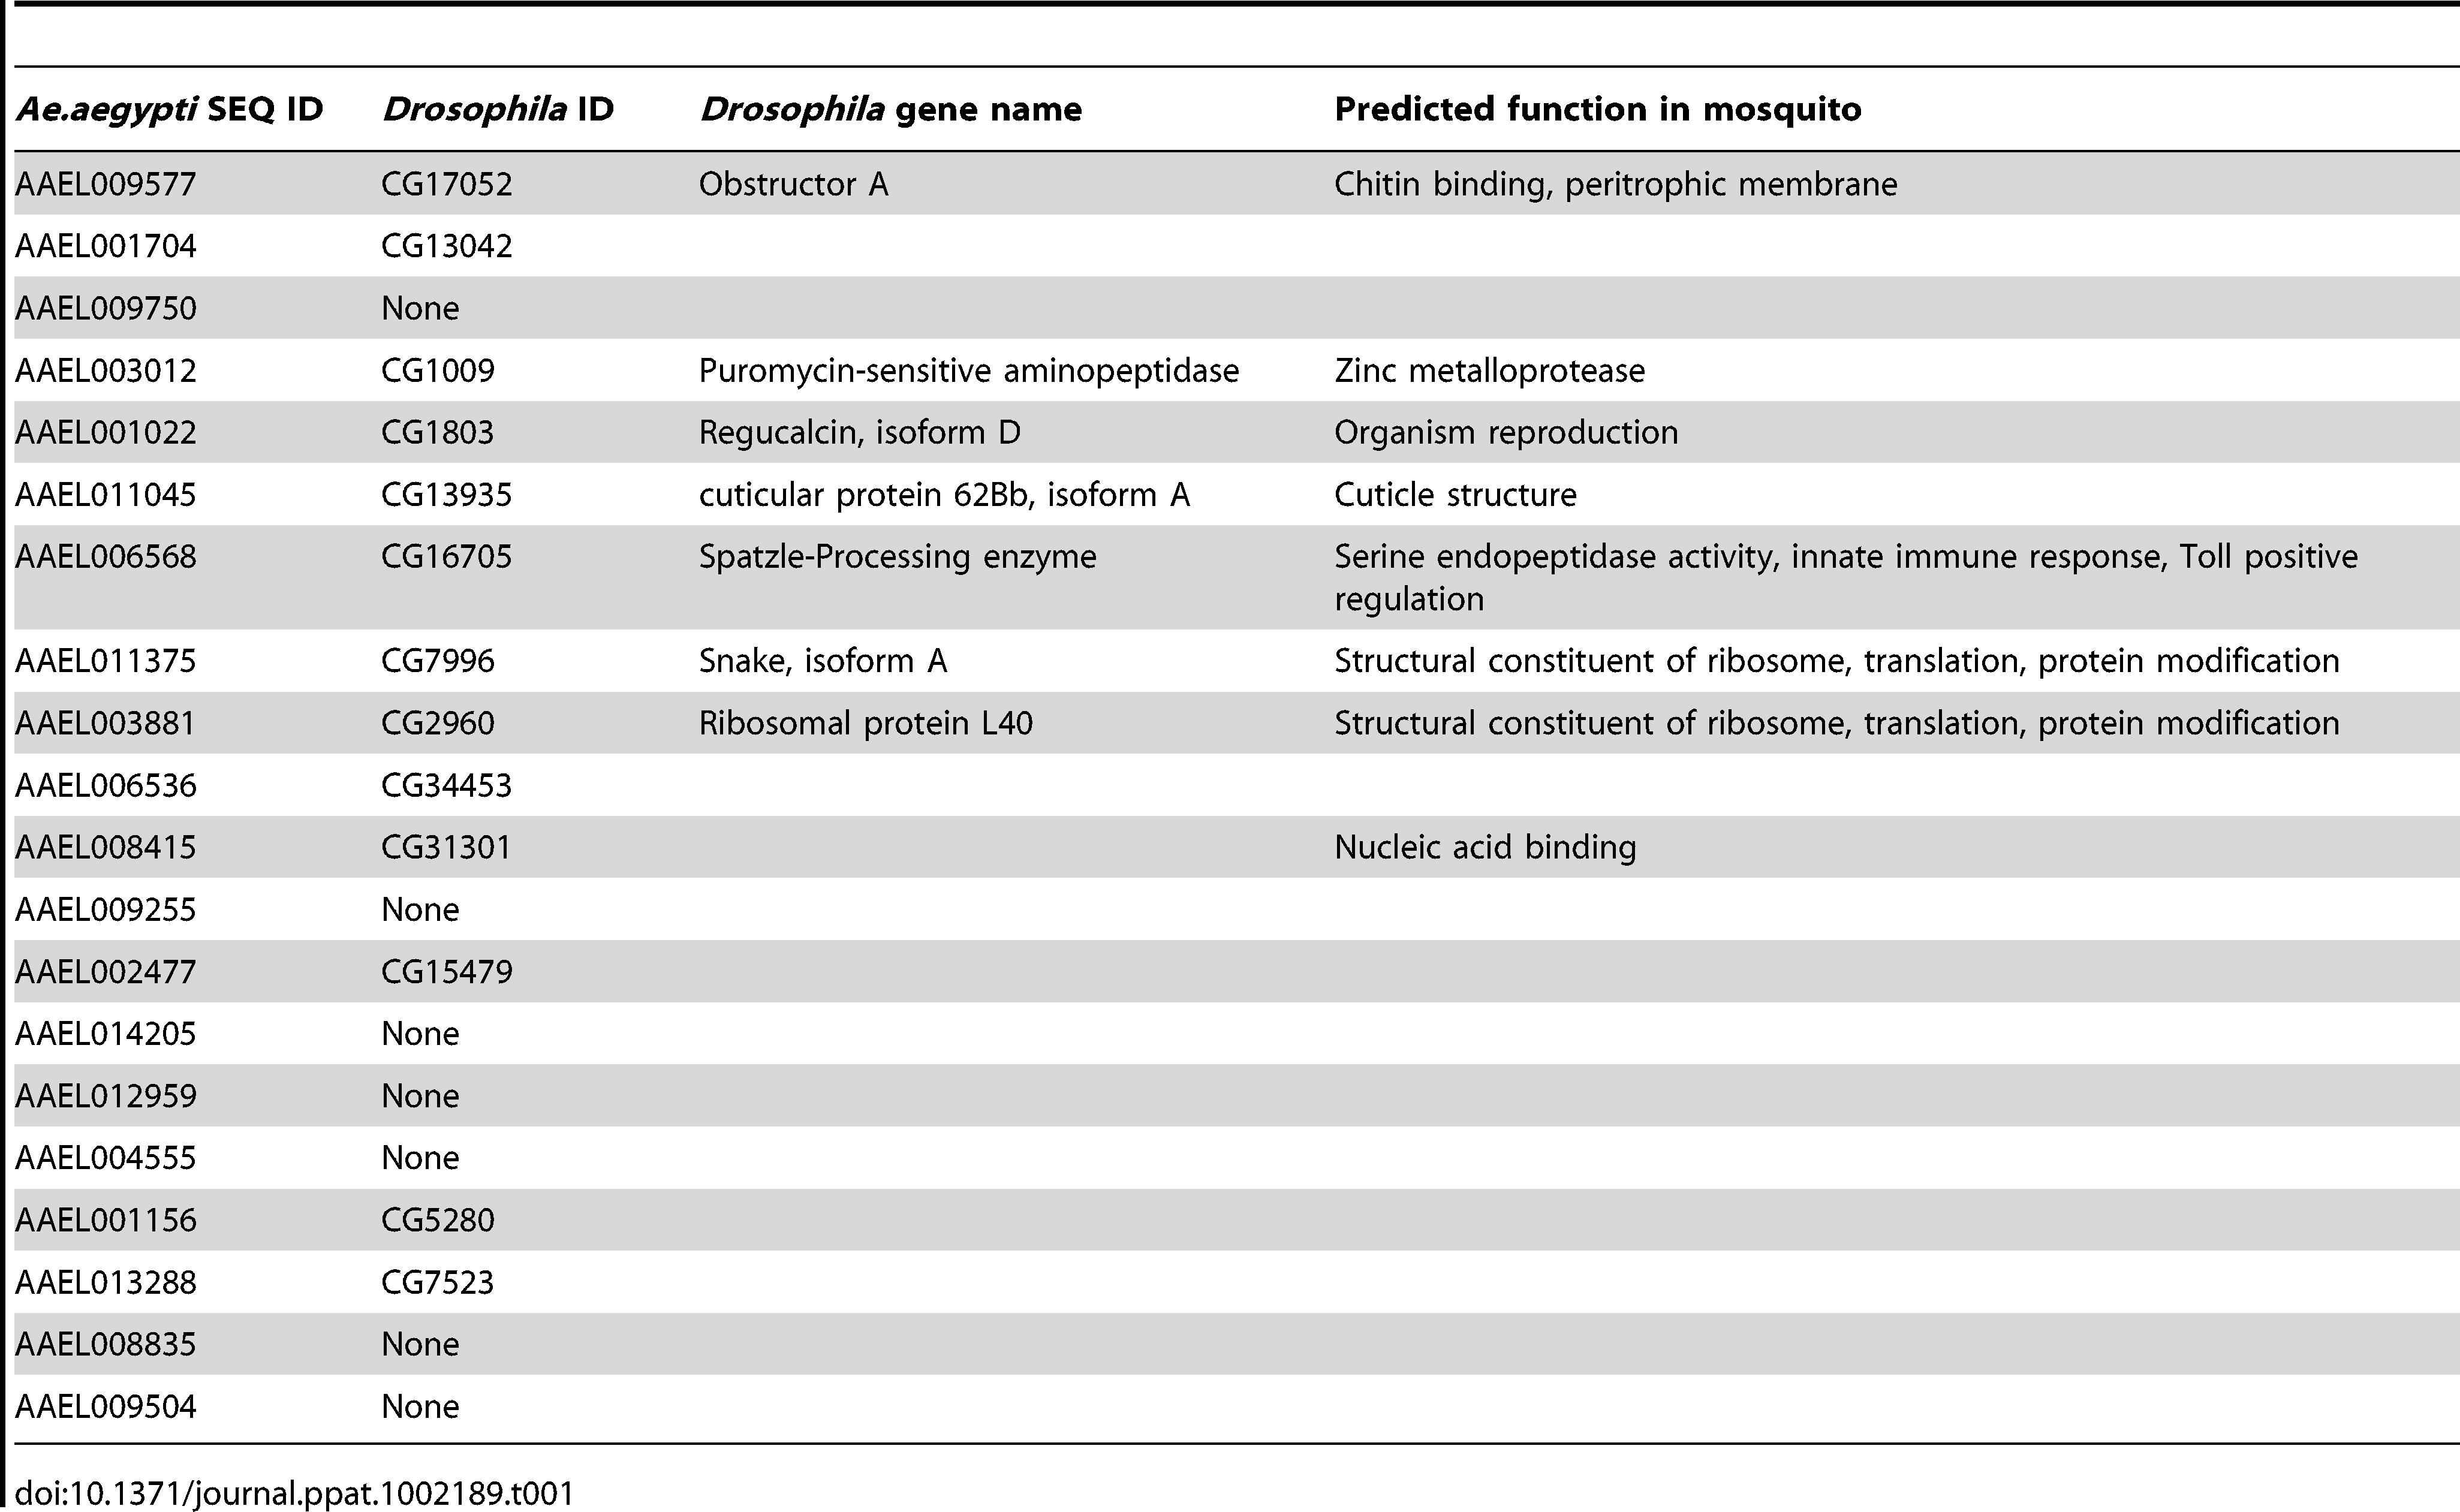 Predicted <i>Ae. aegypti</i> gene function and closest homolog in <i>Drosophila</i>.